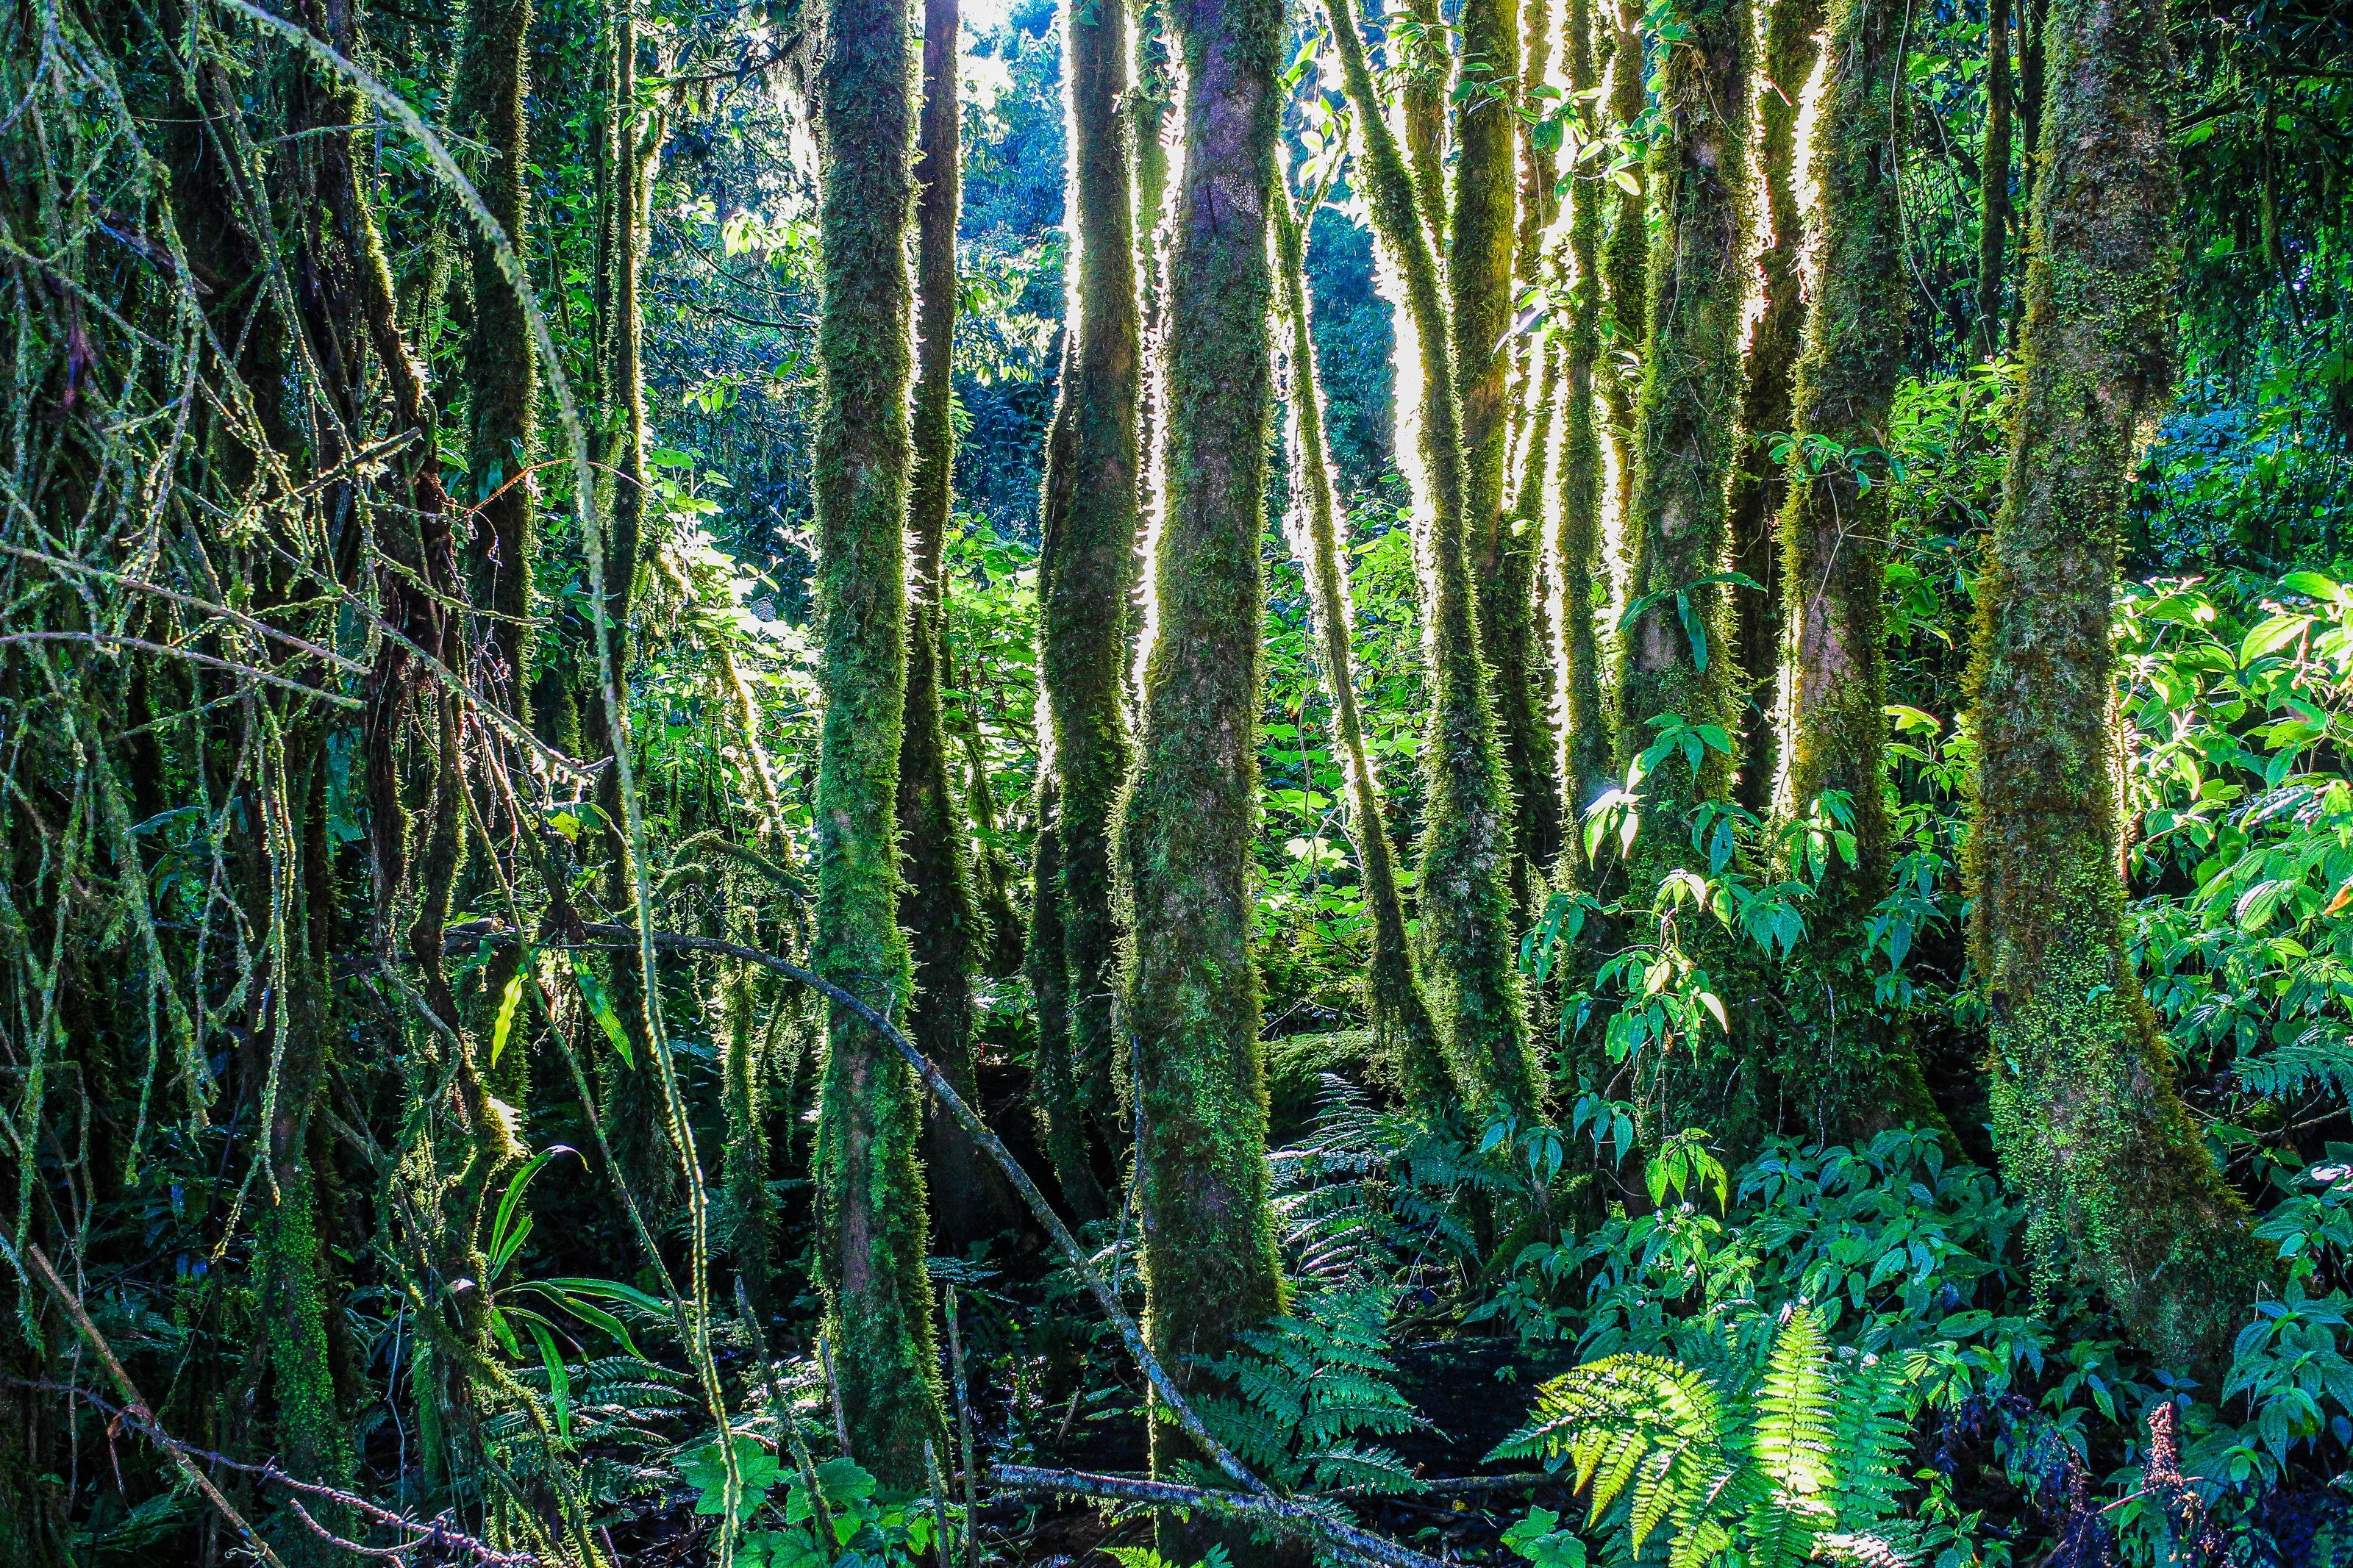 Green Leafed Trees Near Waterfalls 183 Free Stock Photo